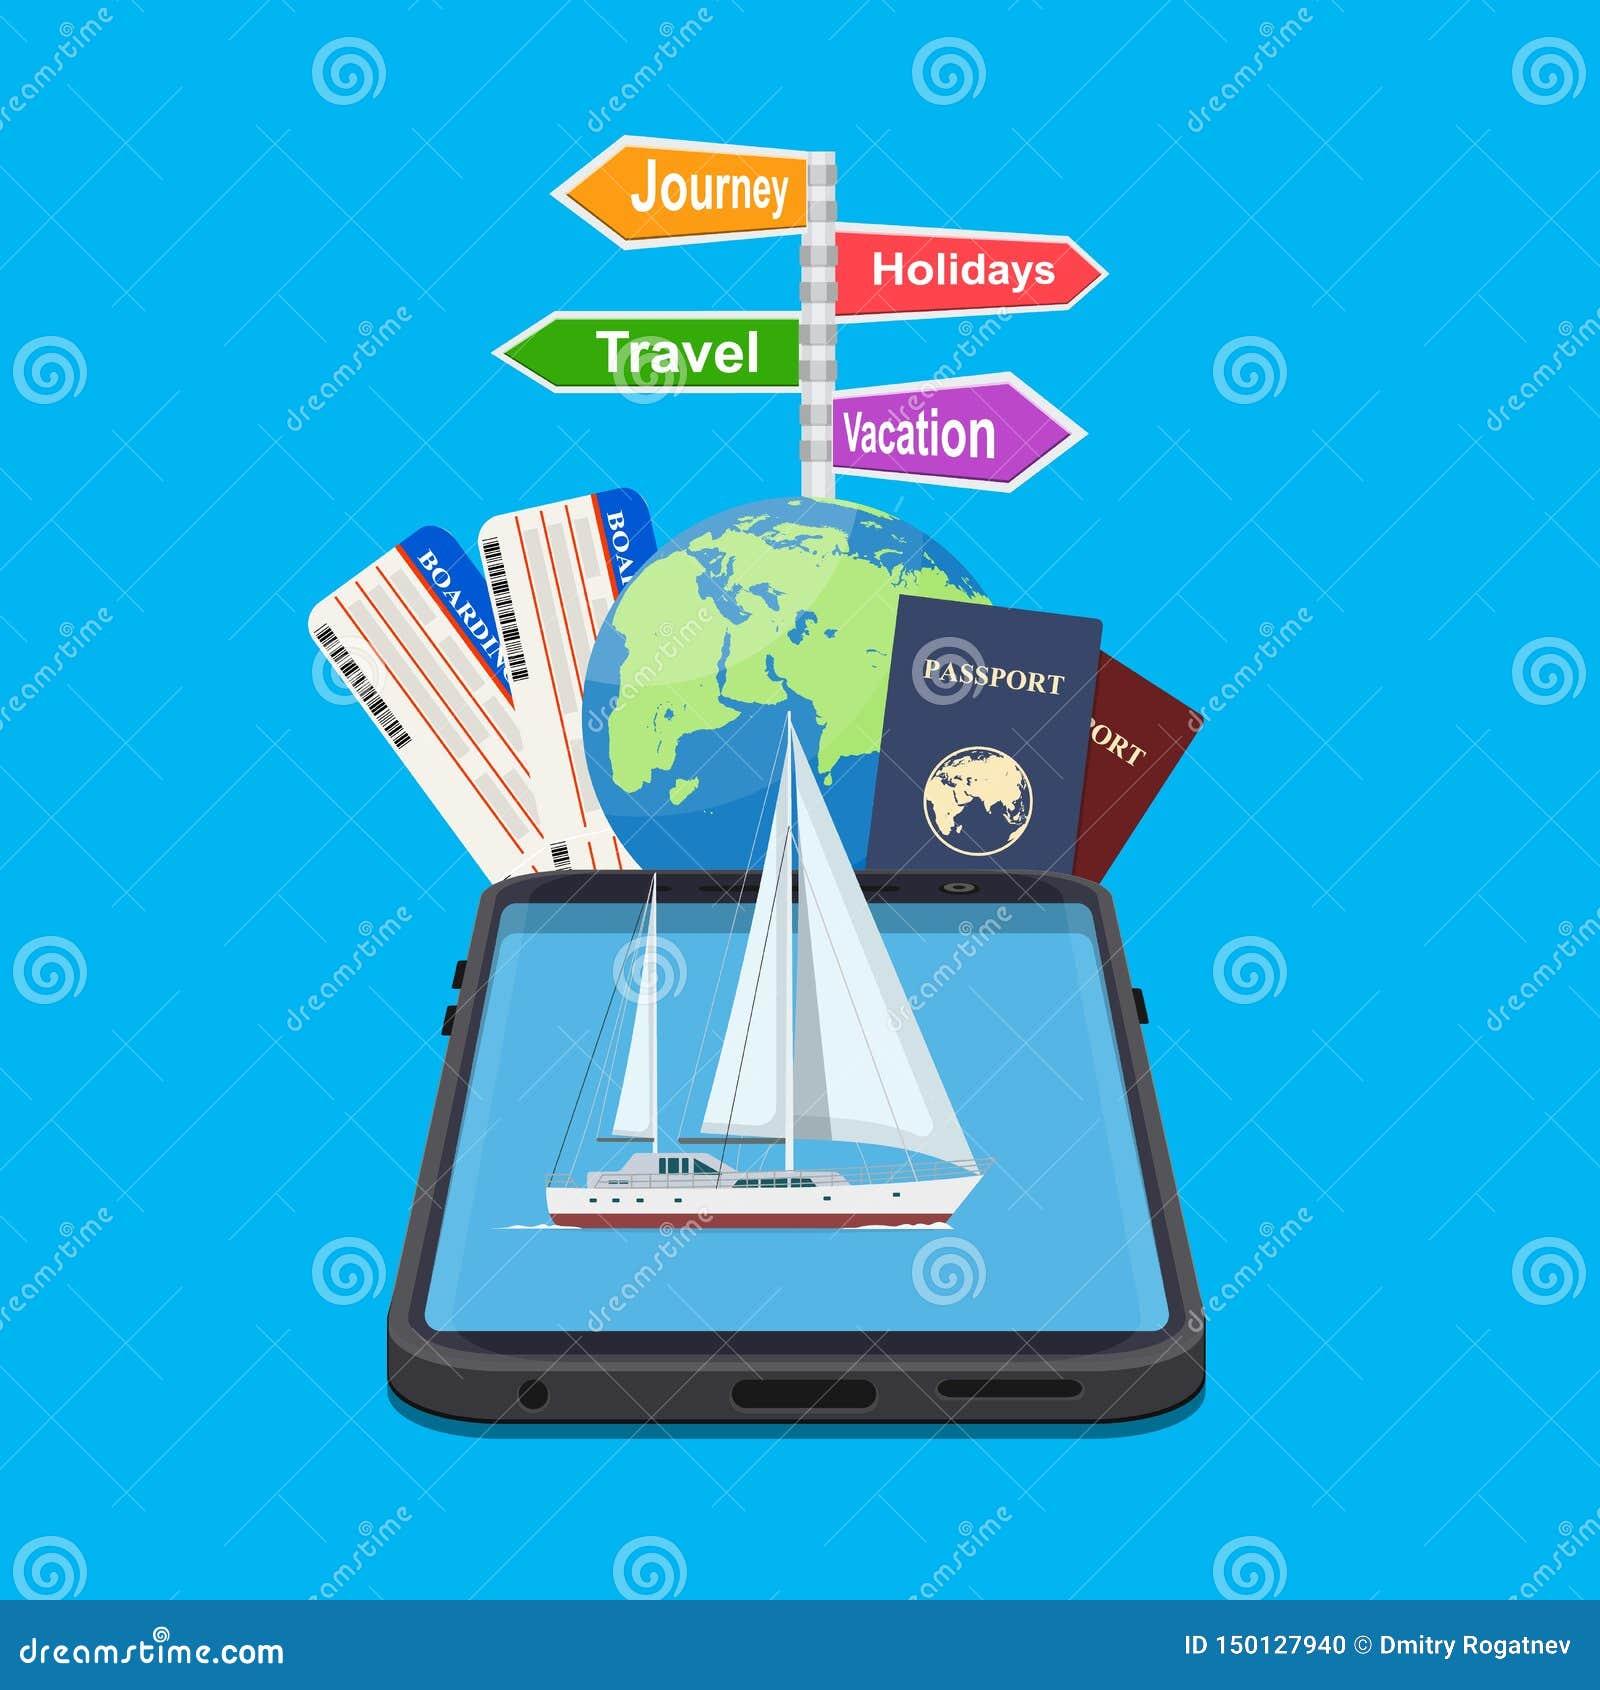 Online Holiday Travel Mobile App Stock Vector - Illustration